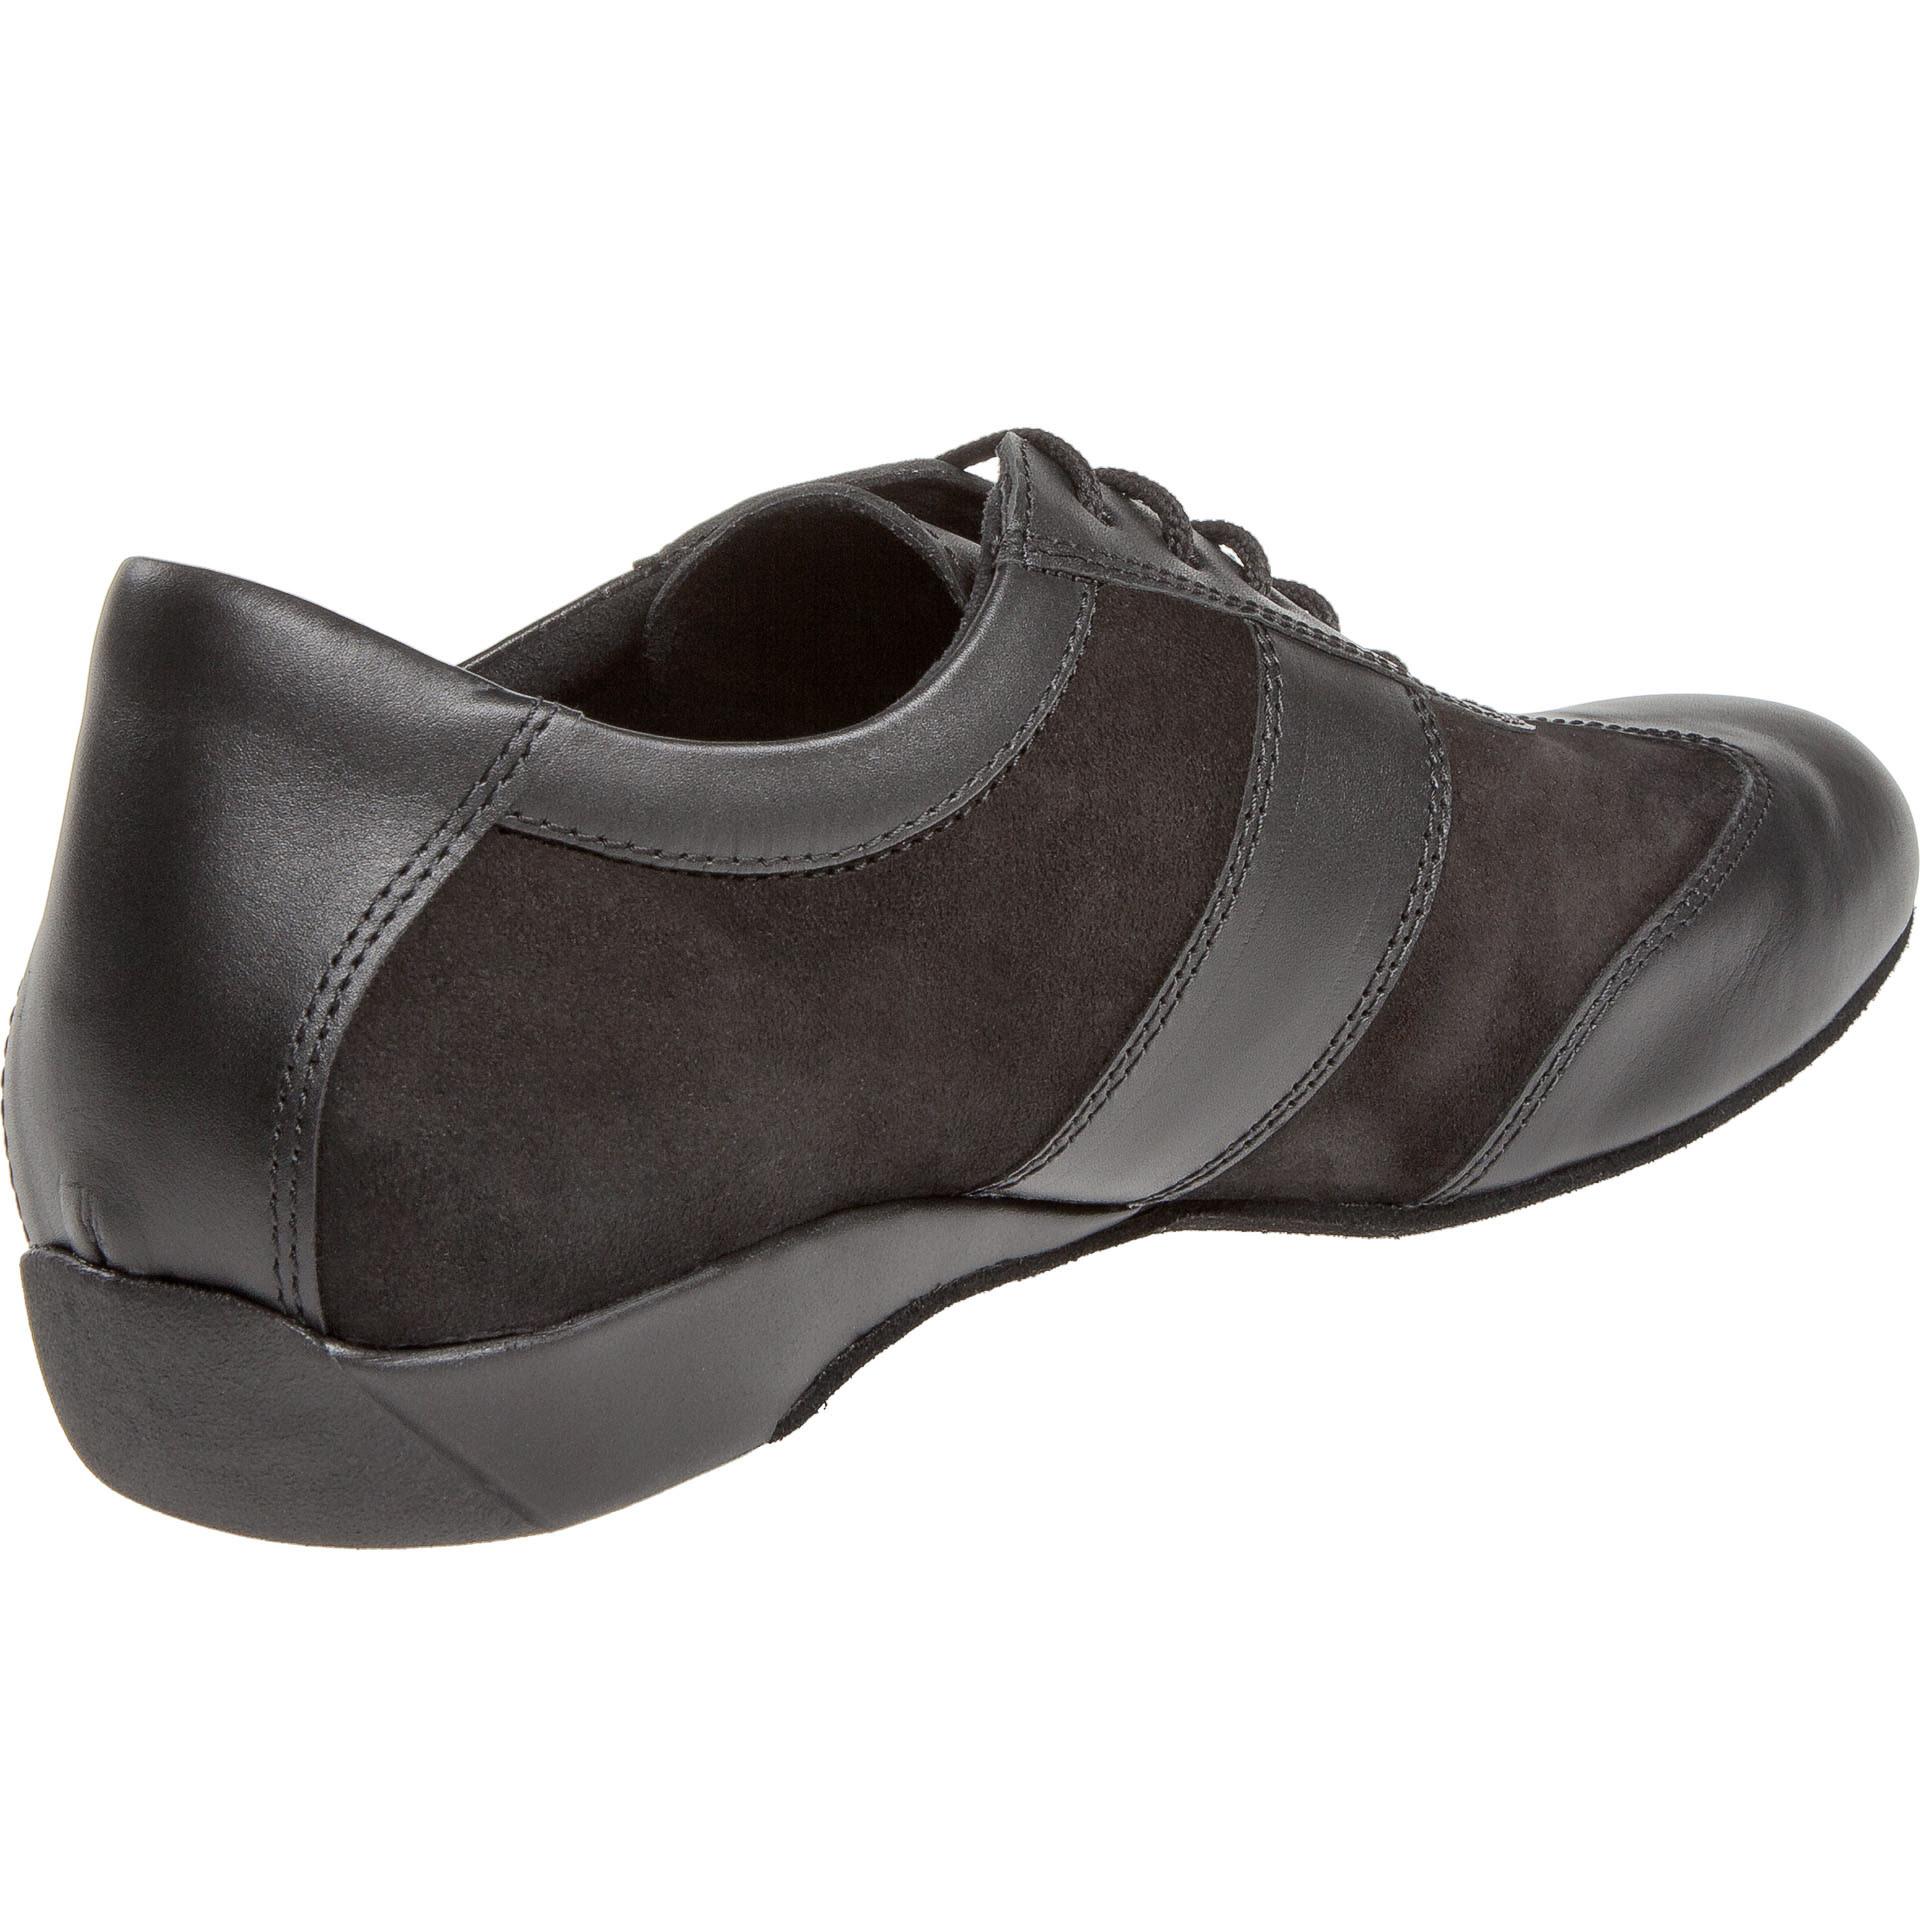 Diamant 123-225-070-Men Ballroom Sneakers 1'' Suede Sole-BLACK LEATHER / SUEDE